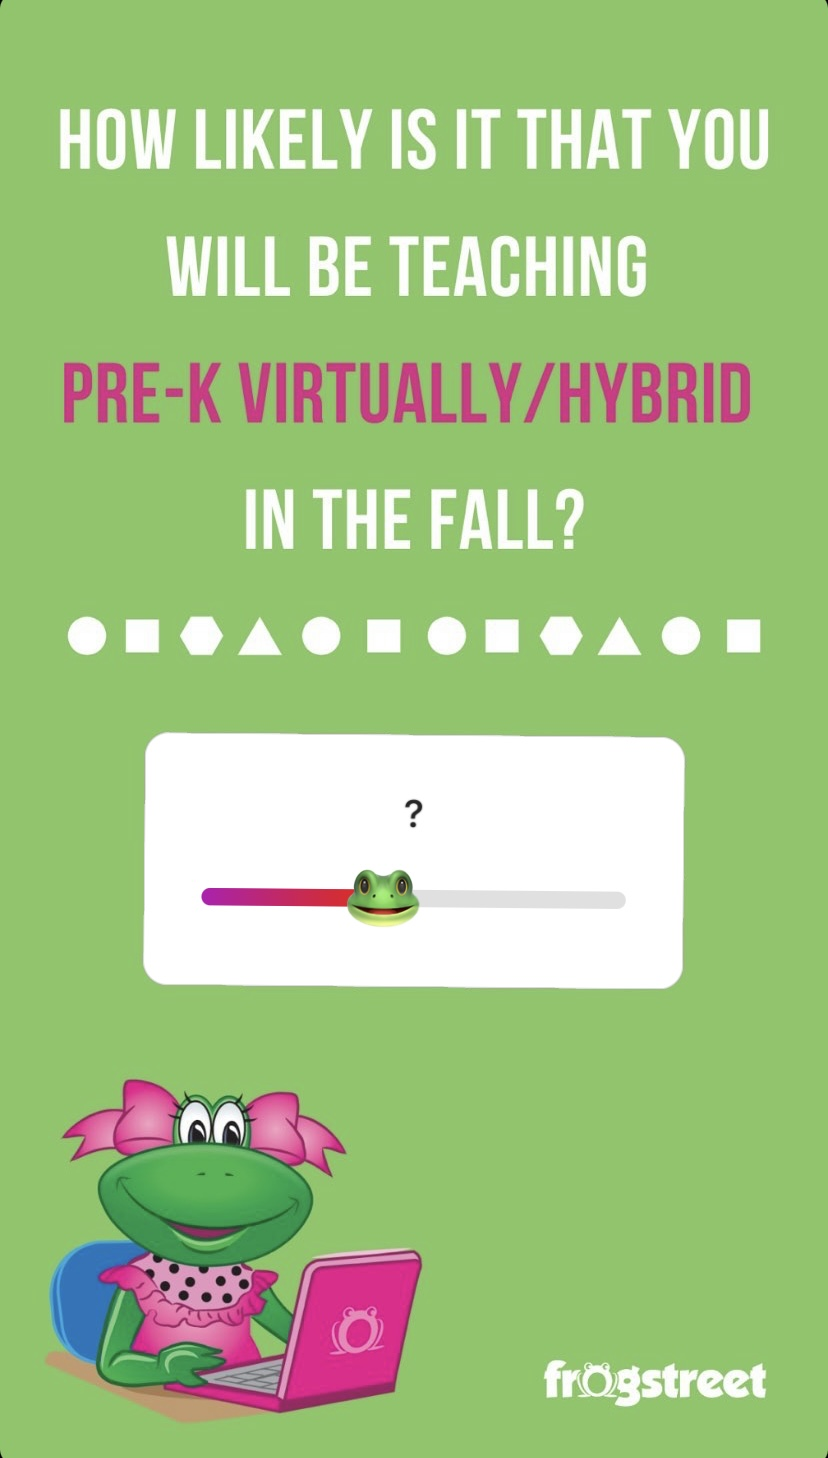 20210519-Frog Street- Virtual PreK IG Poll Results